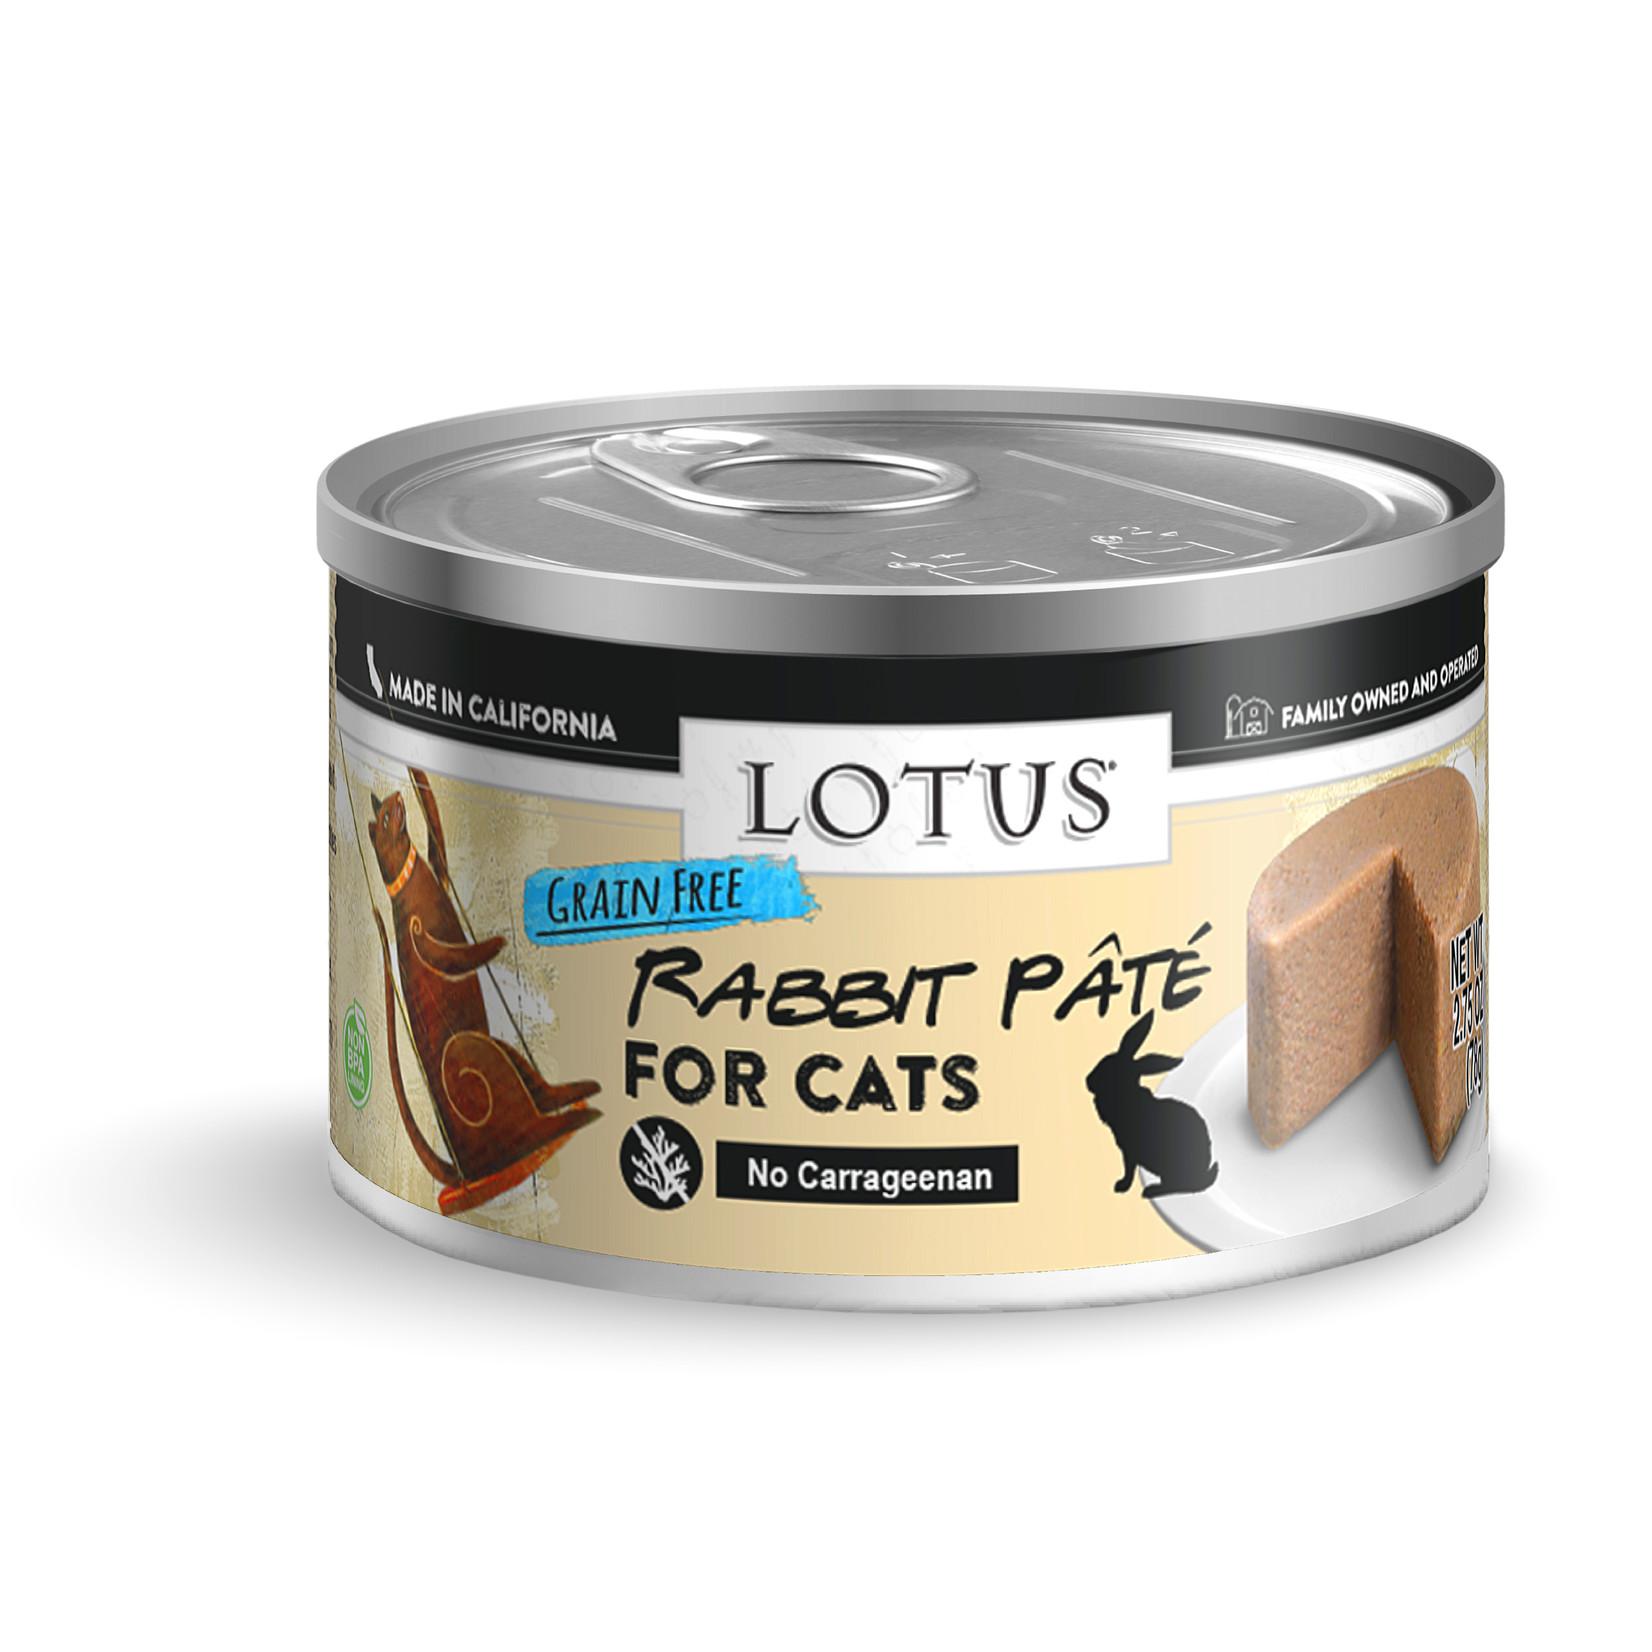 Lotus Lotus Rabbit Pate Canned Cat Food